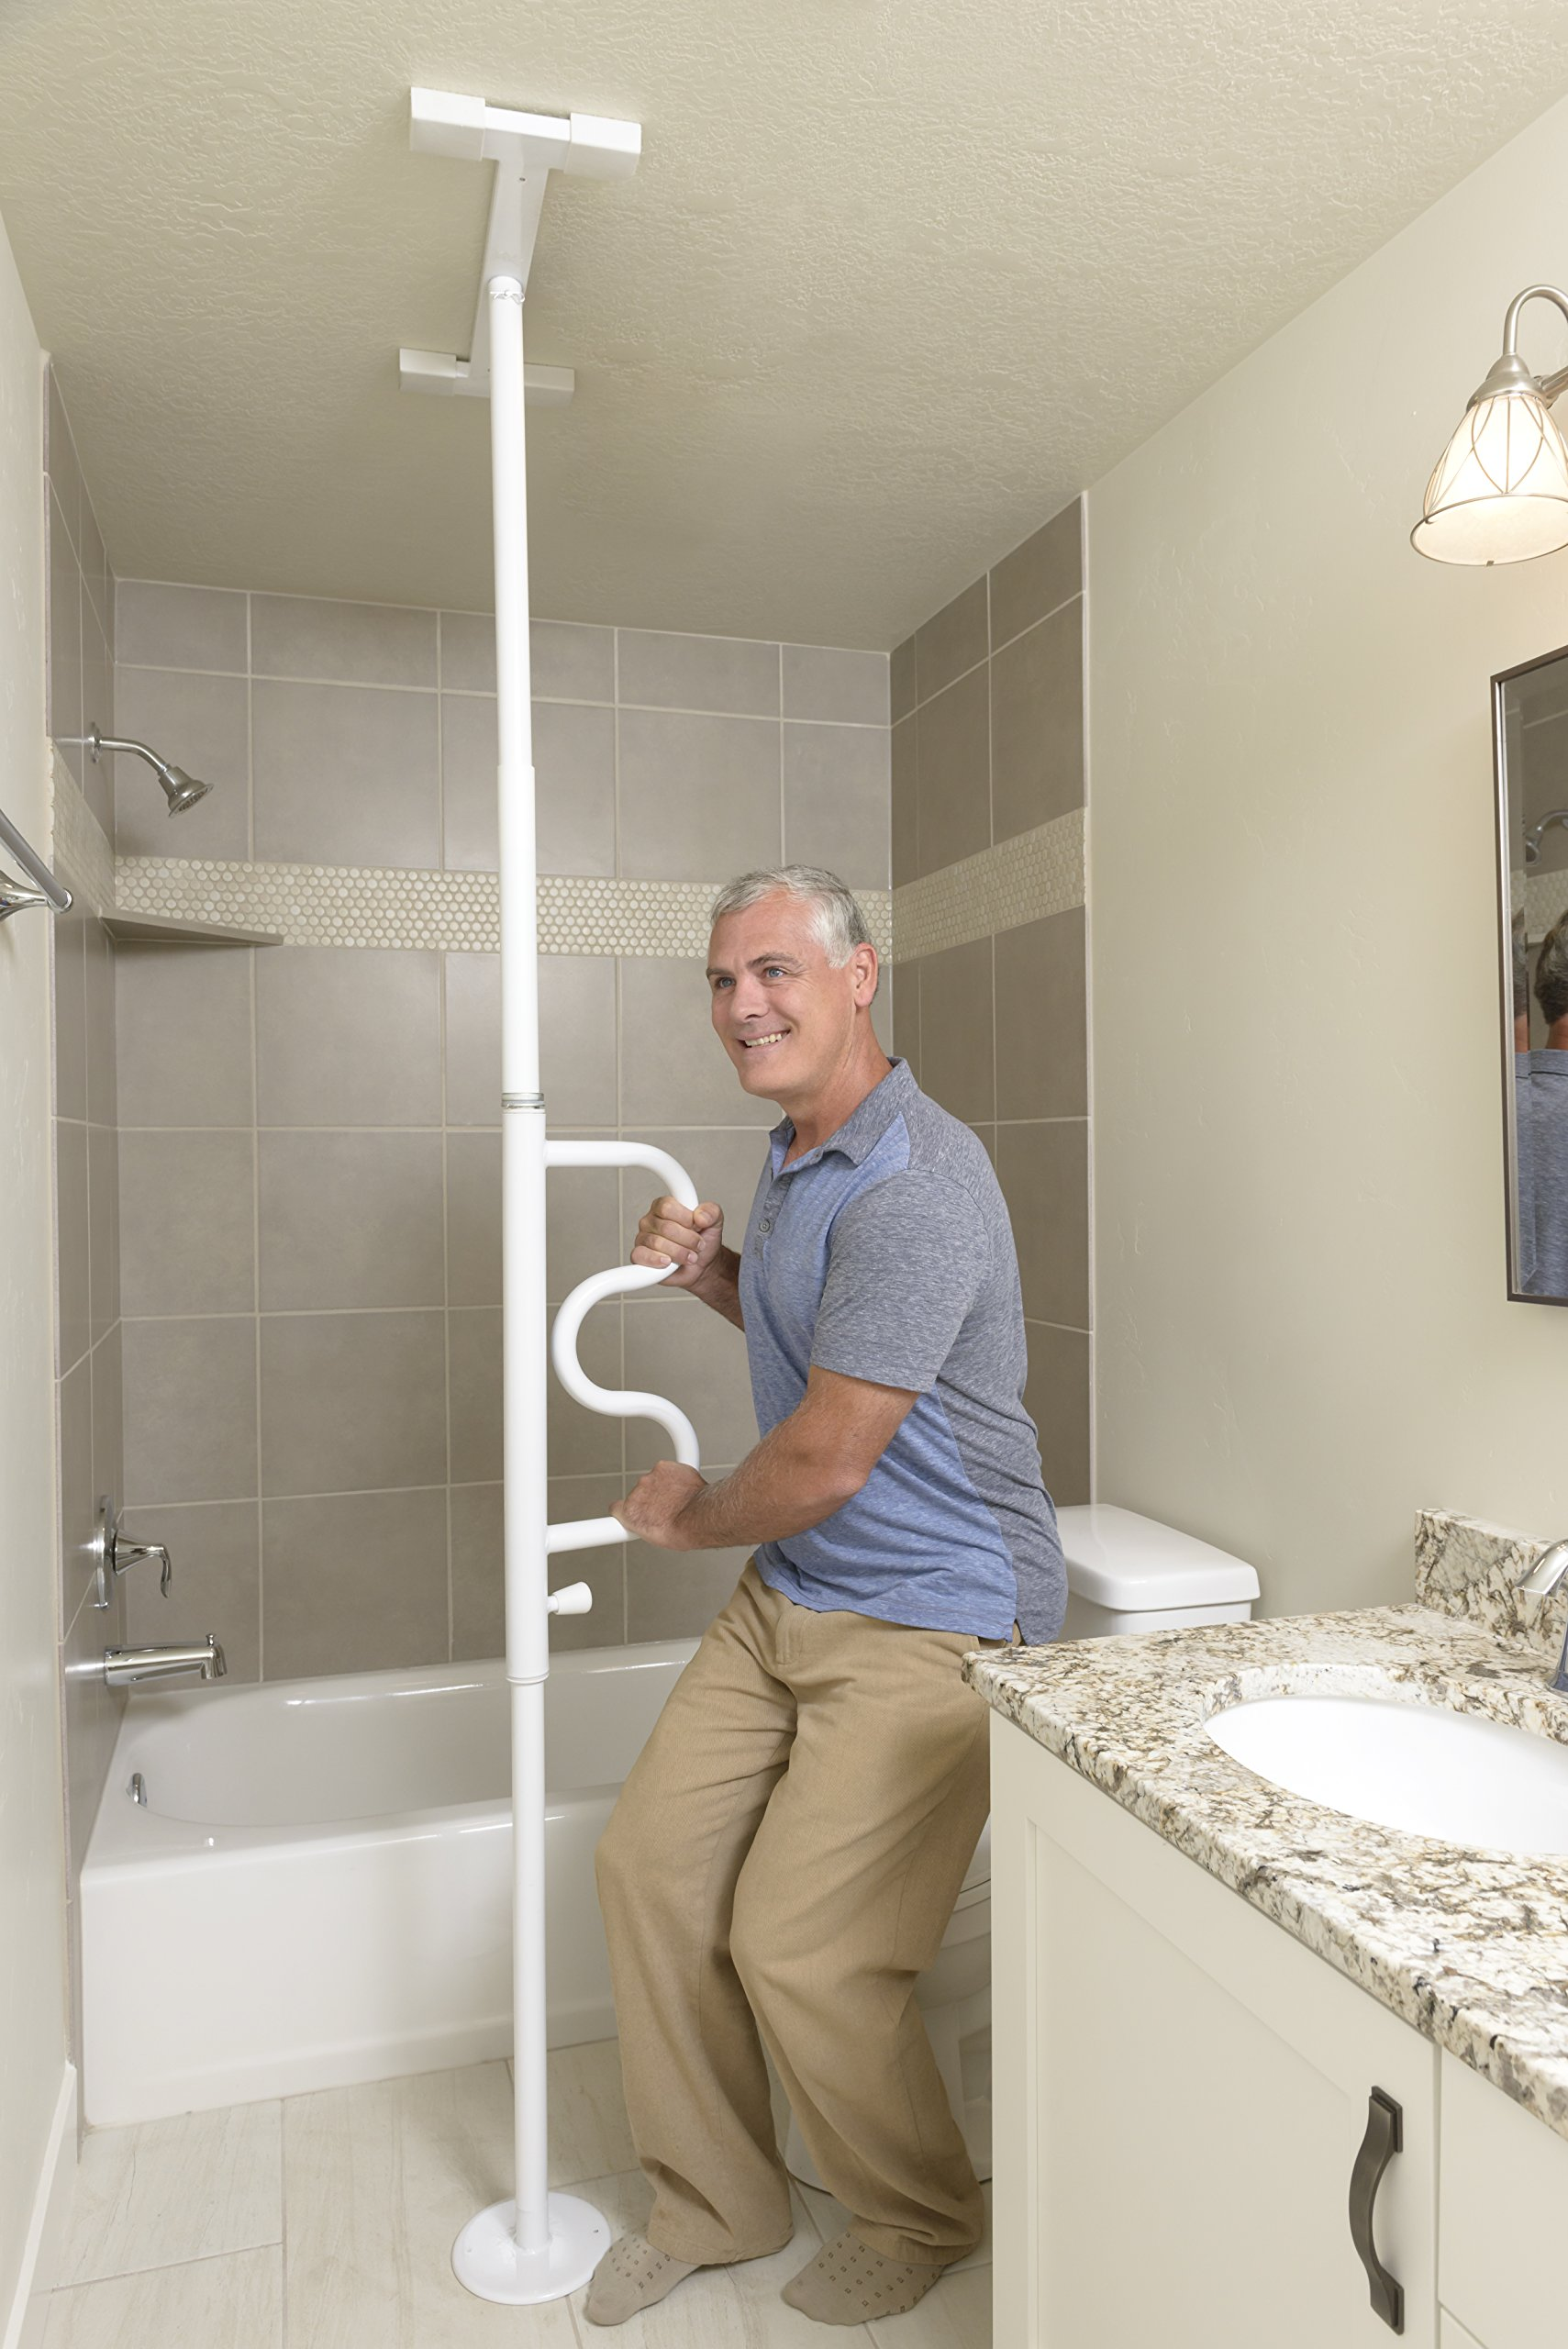 Stander Security Pole & Curve Grab Bar - Elderly Tension Mounted Transfer Pole + Bathroom Assist Grab Bar - Iceberg White by Stander (Image #2)